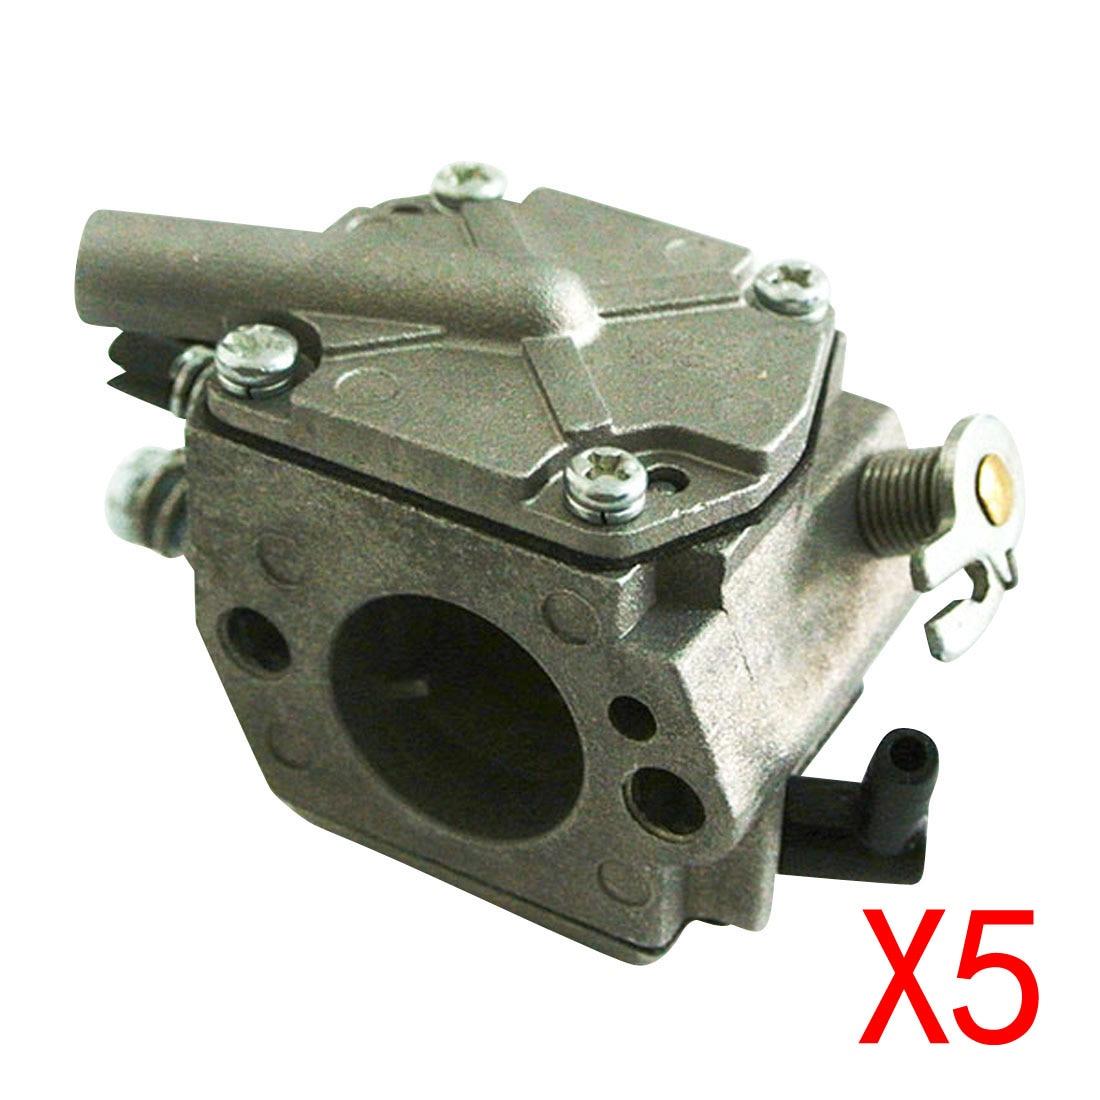 5pcs Carburetor Carb For STIHL Chainsaw 038 MS380 MS381 Engine Carb